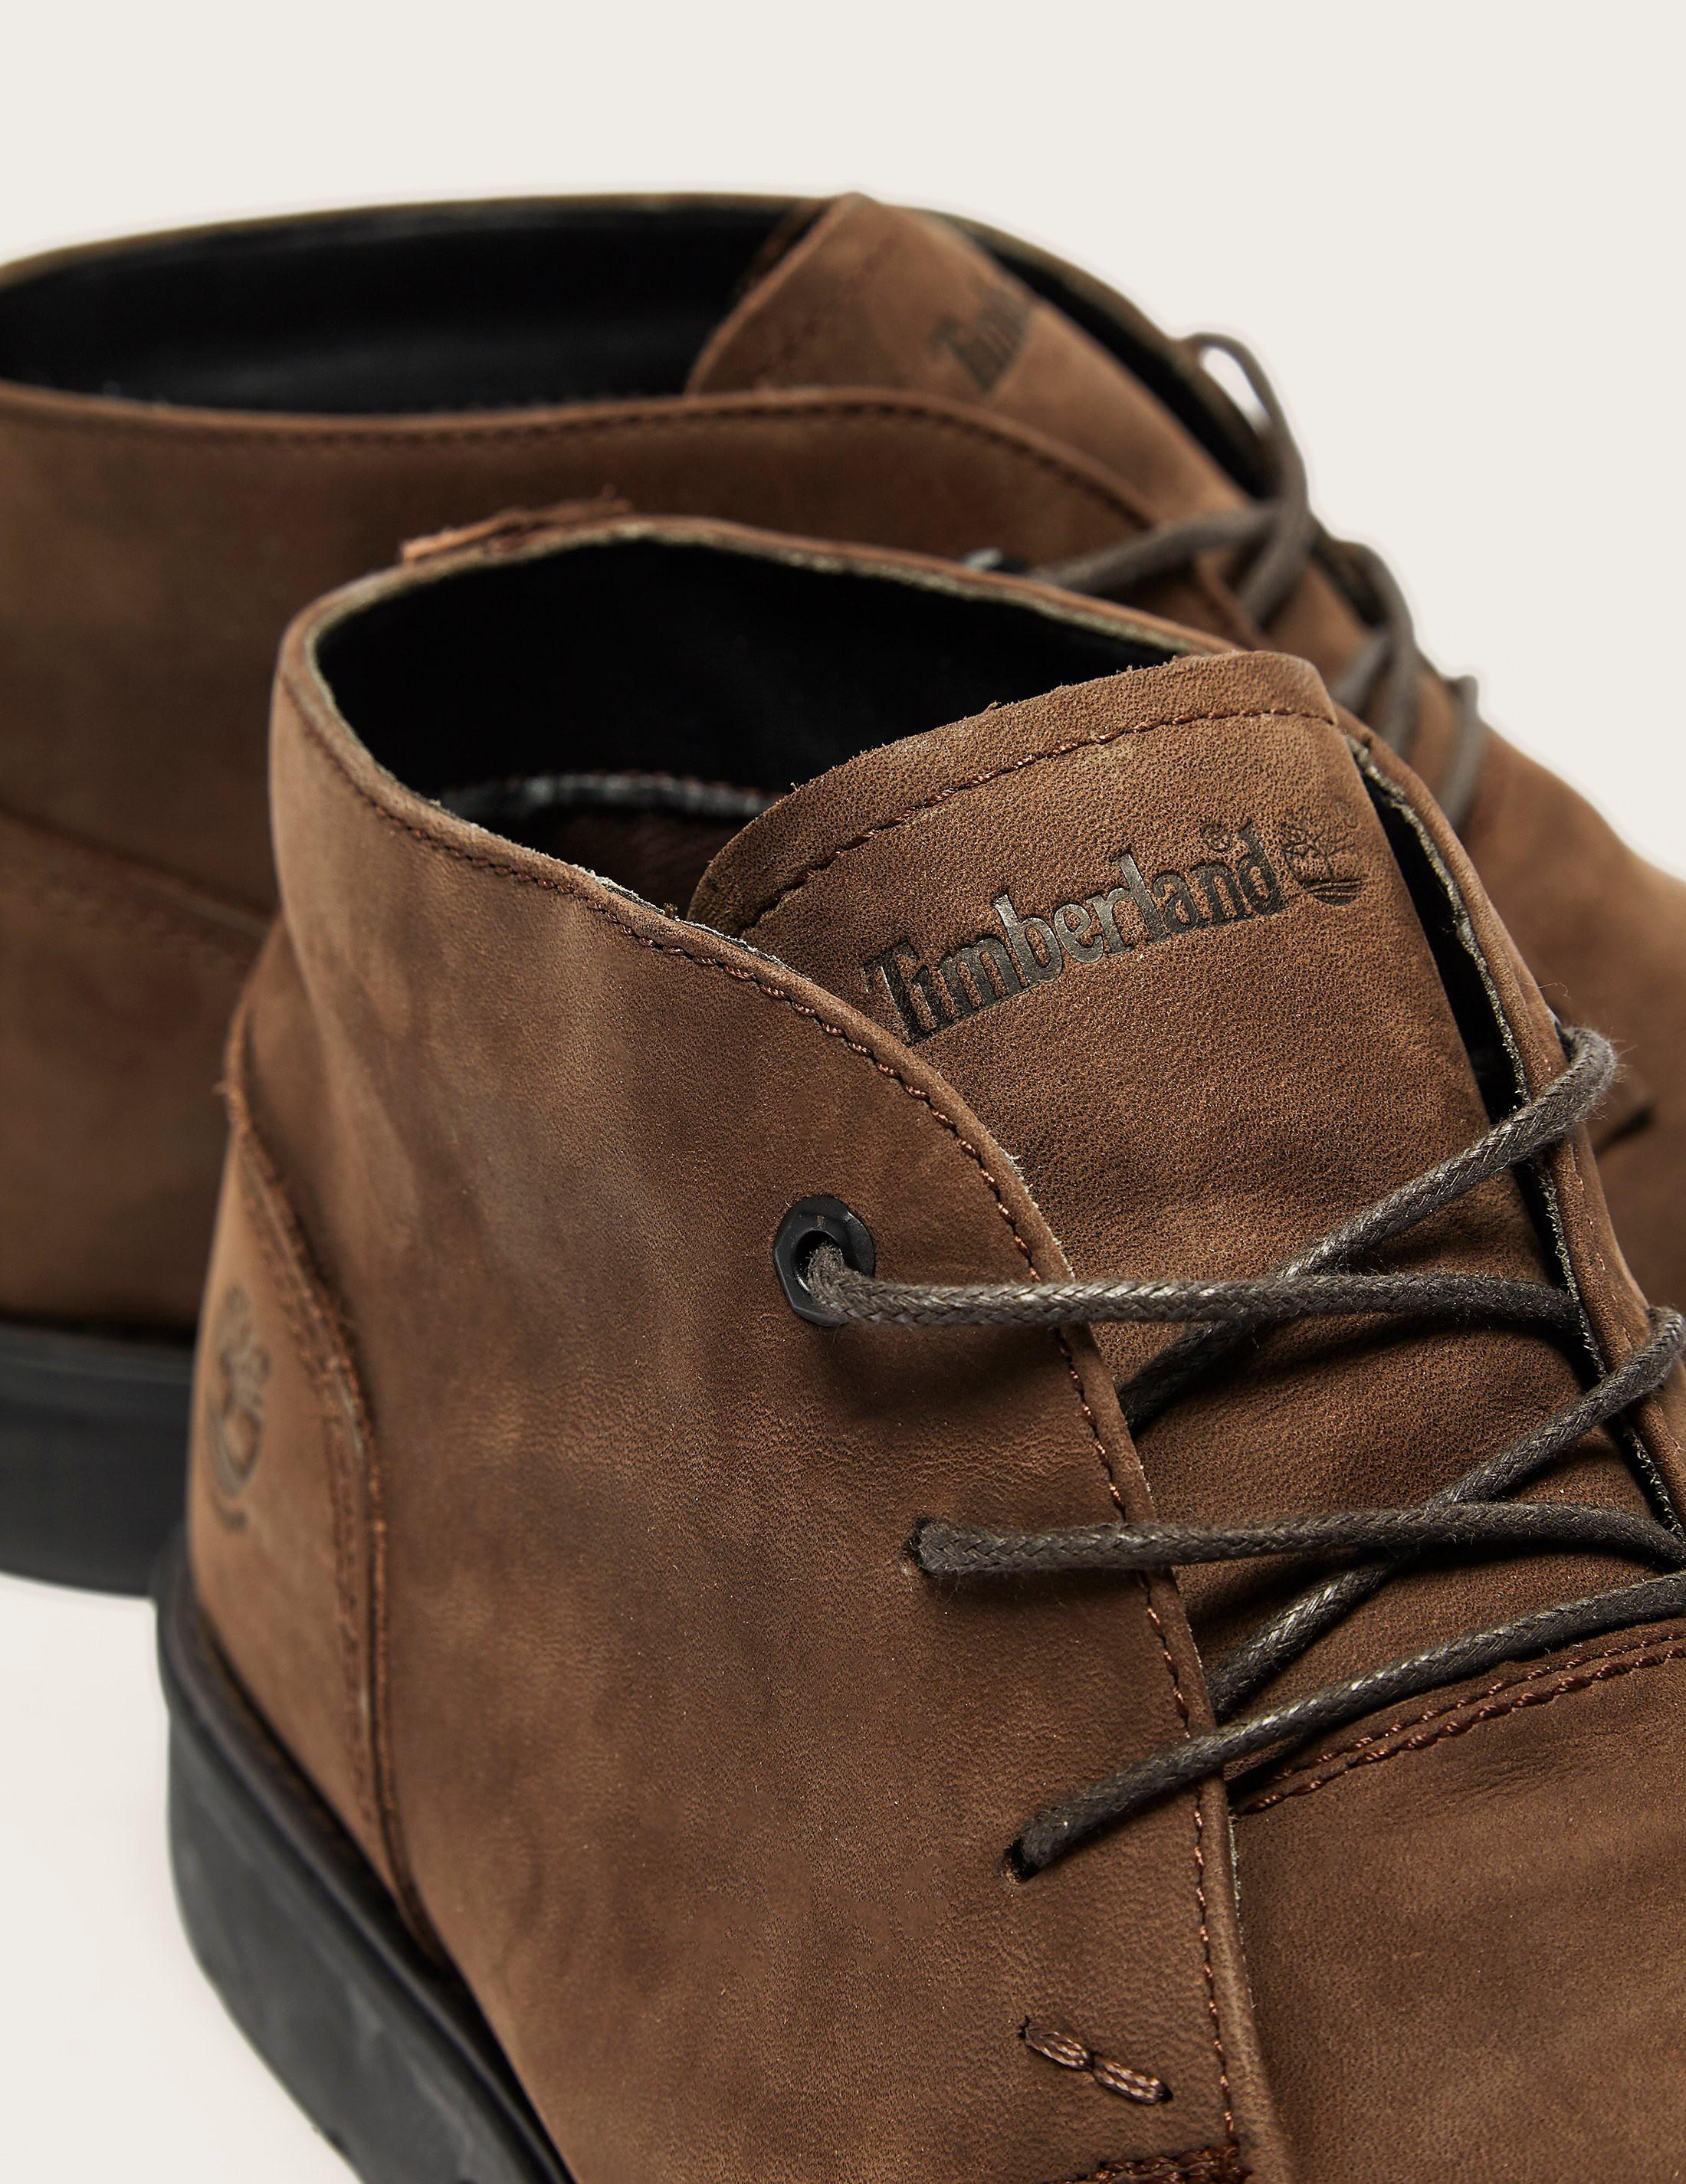 Timberland Carter Notch Chukka Boot